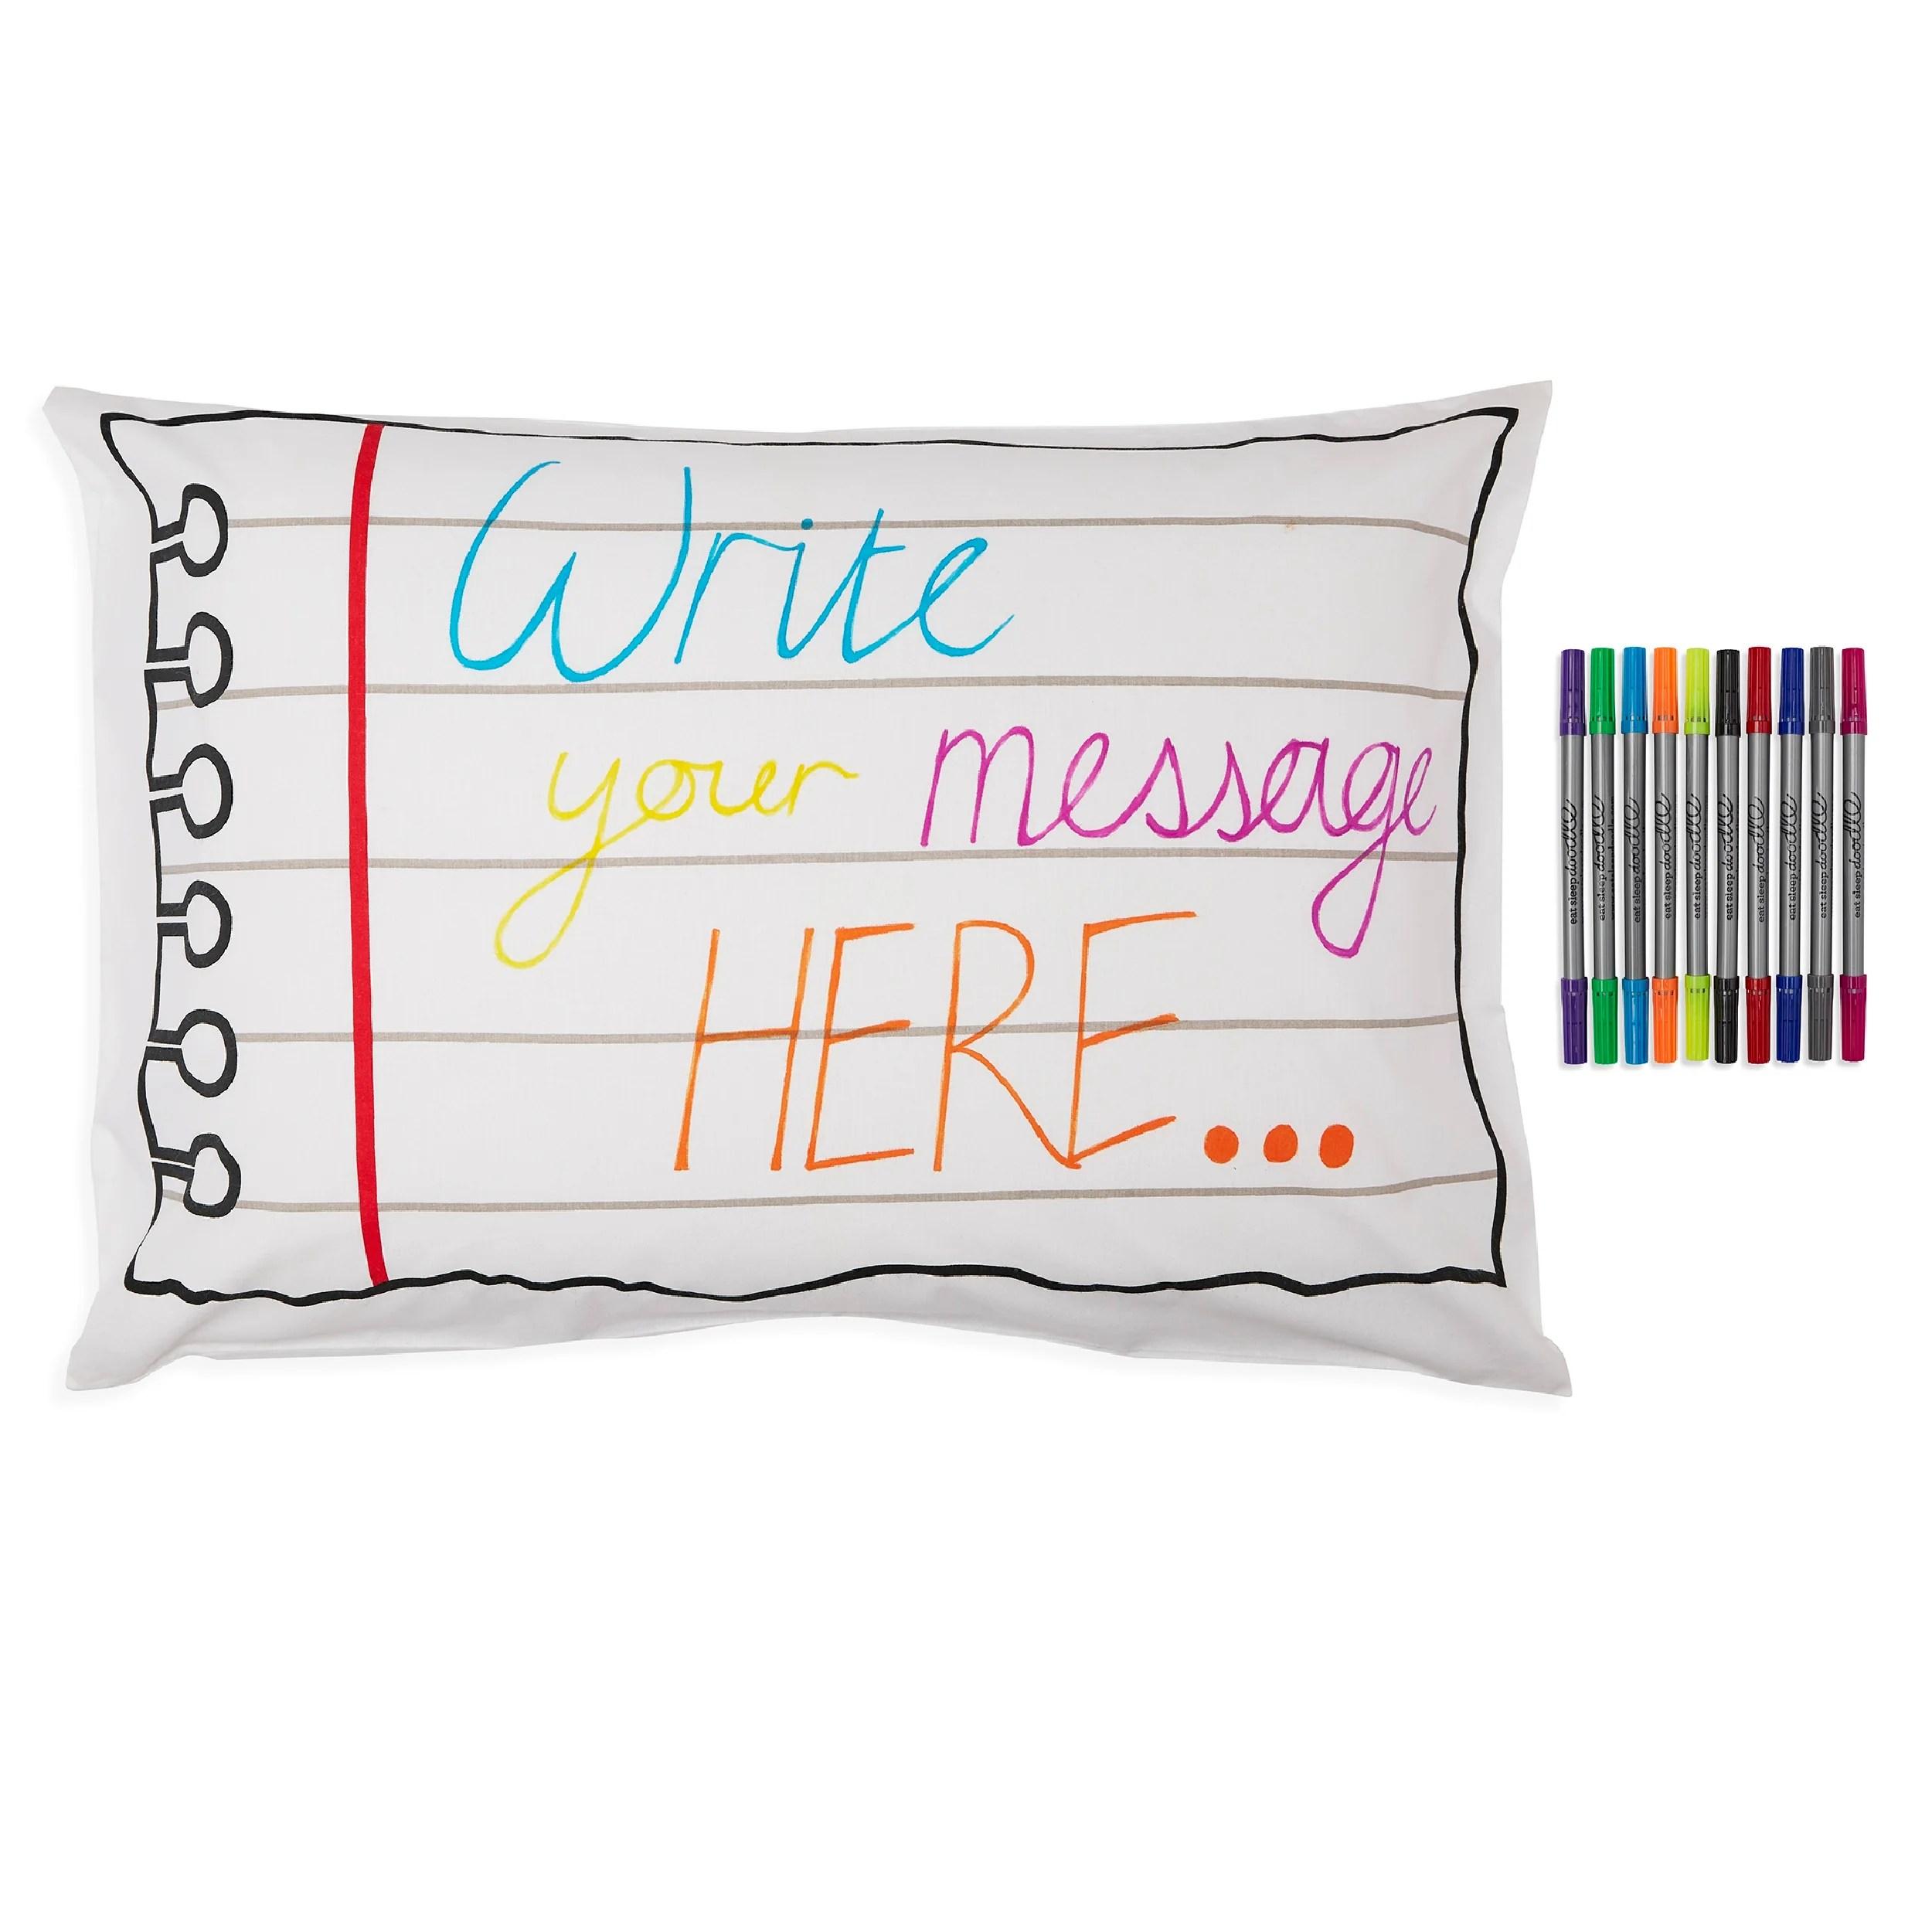 doodle notebook pillowcase color in design